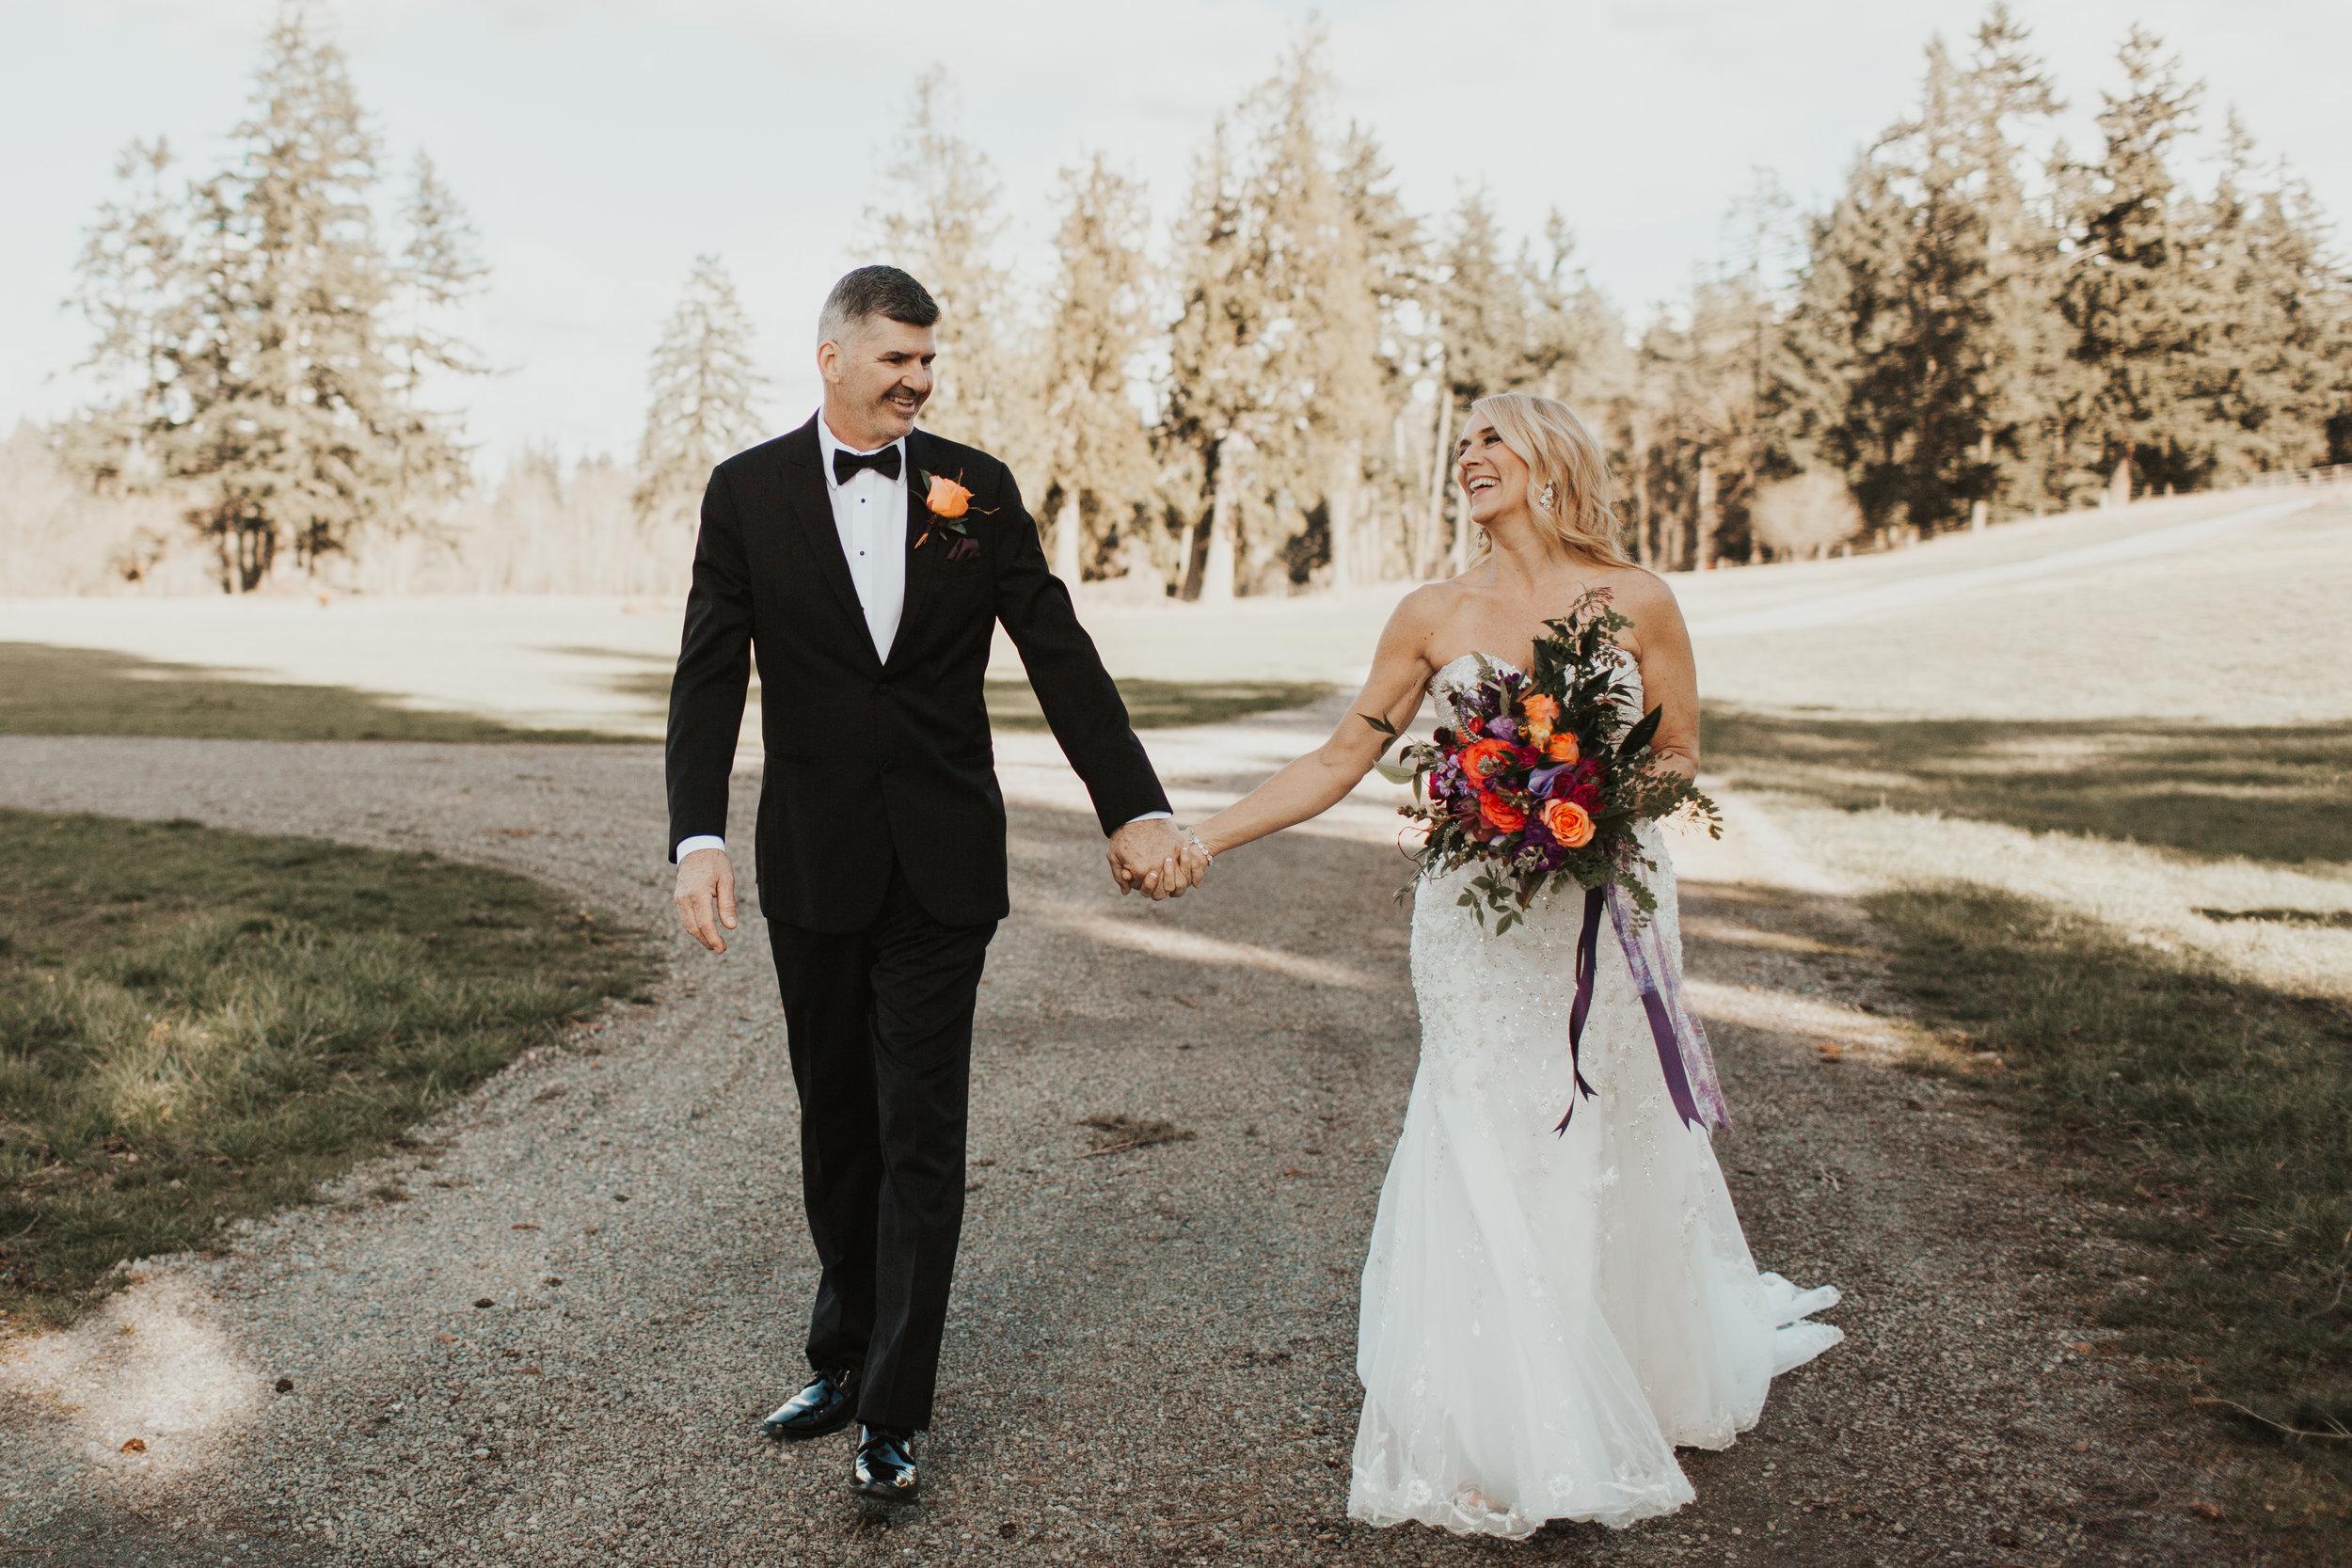 ginapauslon_deenateel_wedding-162.jpg